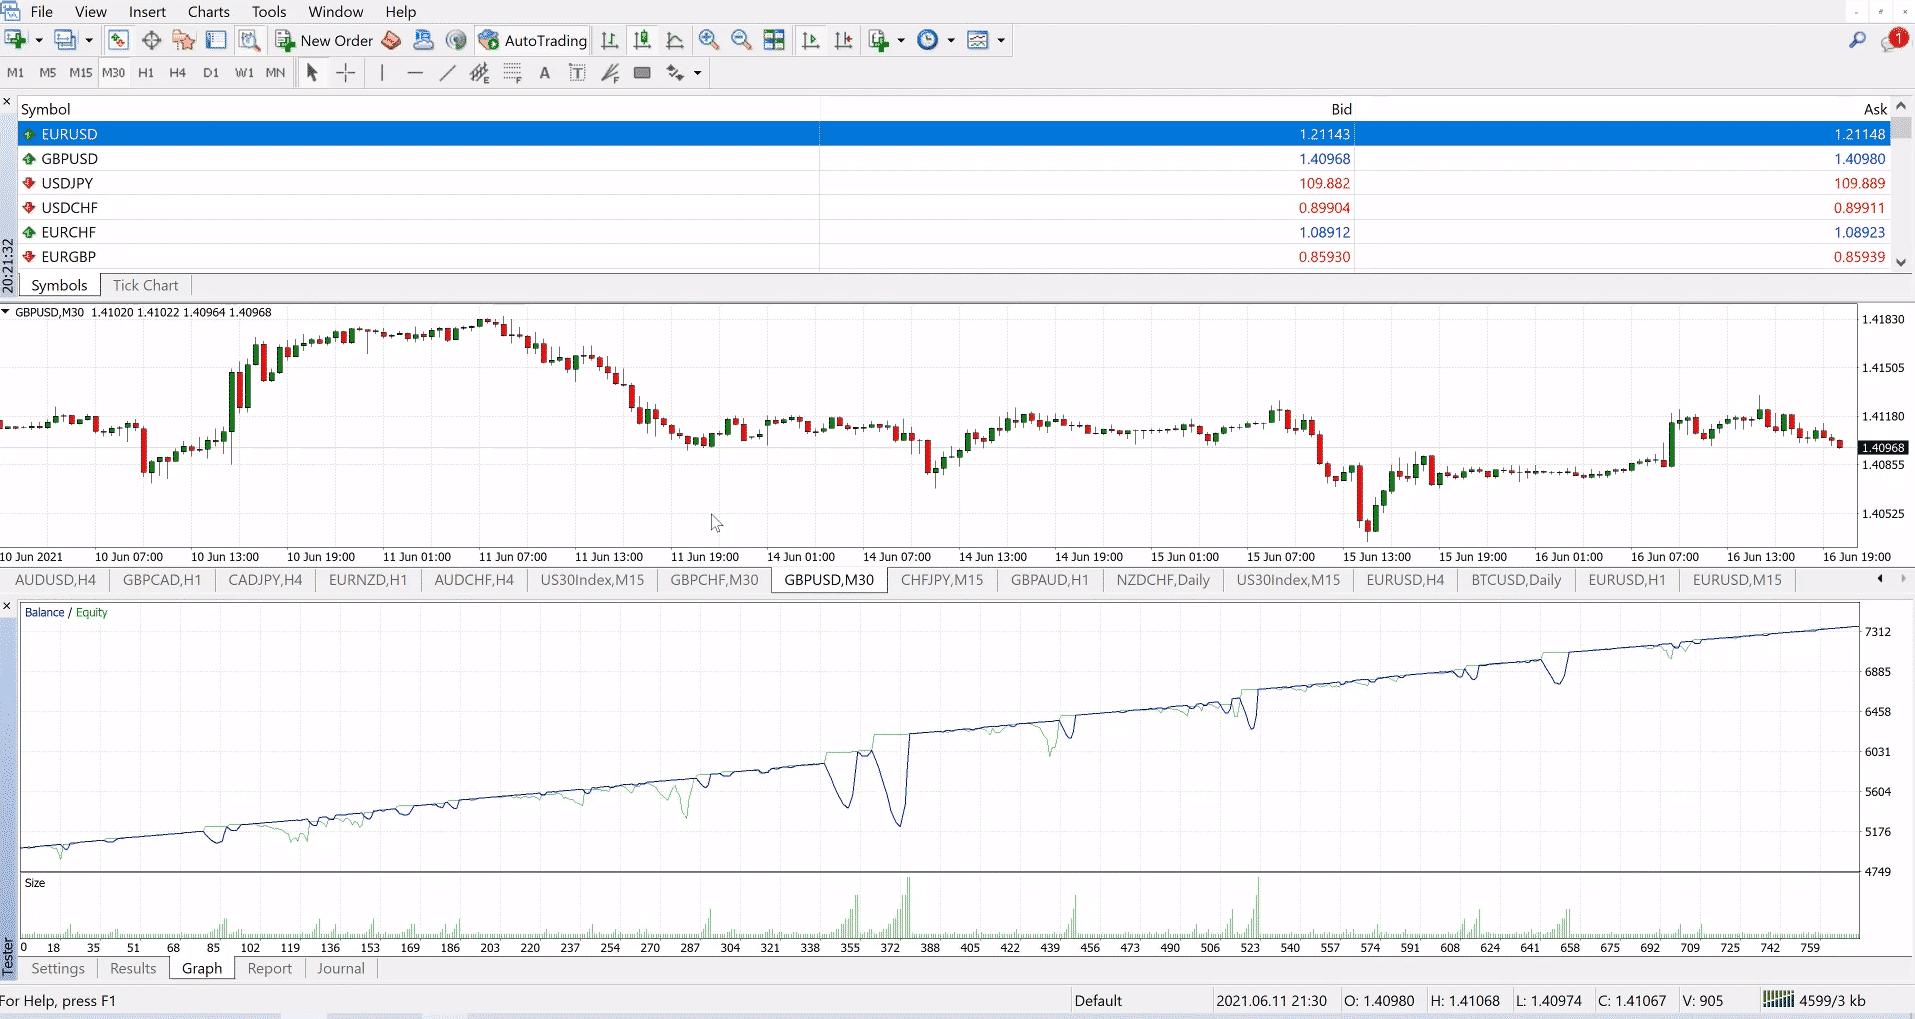 Trading Statistics